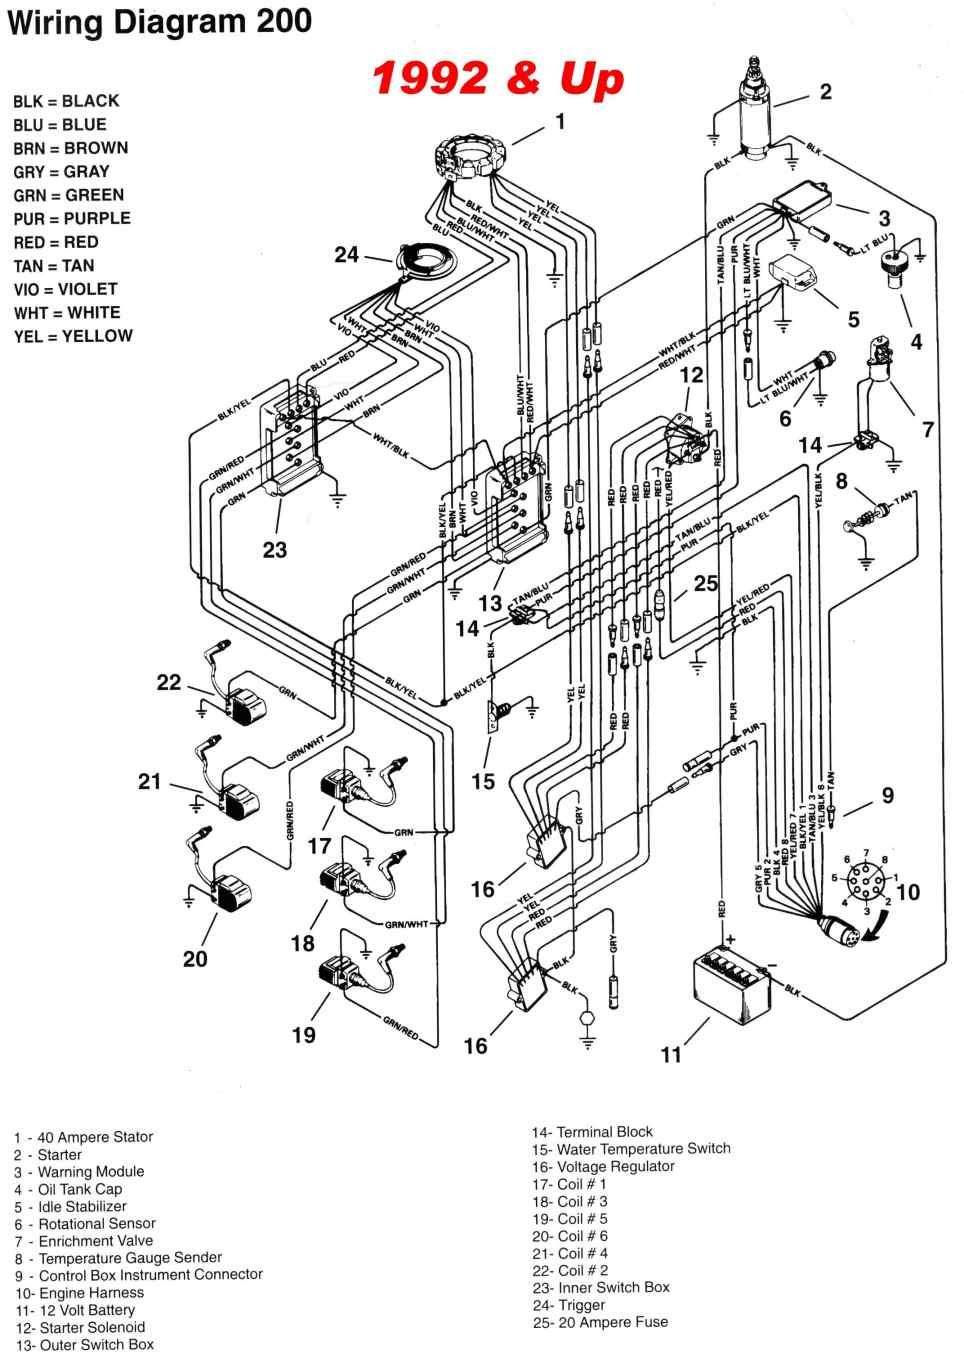 3 0 Alpha One Mercruiser Solenoid Wiring Diagram Gl1000 Wiring Diagram Begeboy Wiring Diagram Source